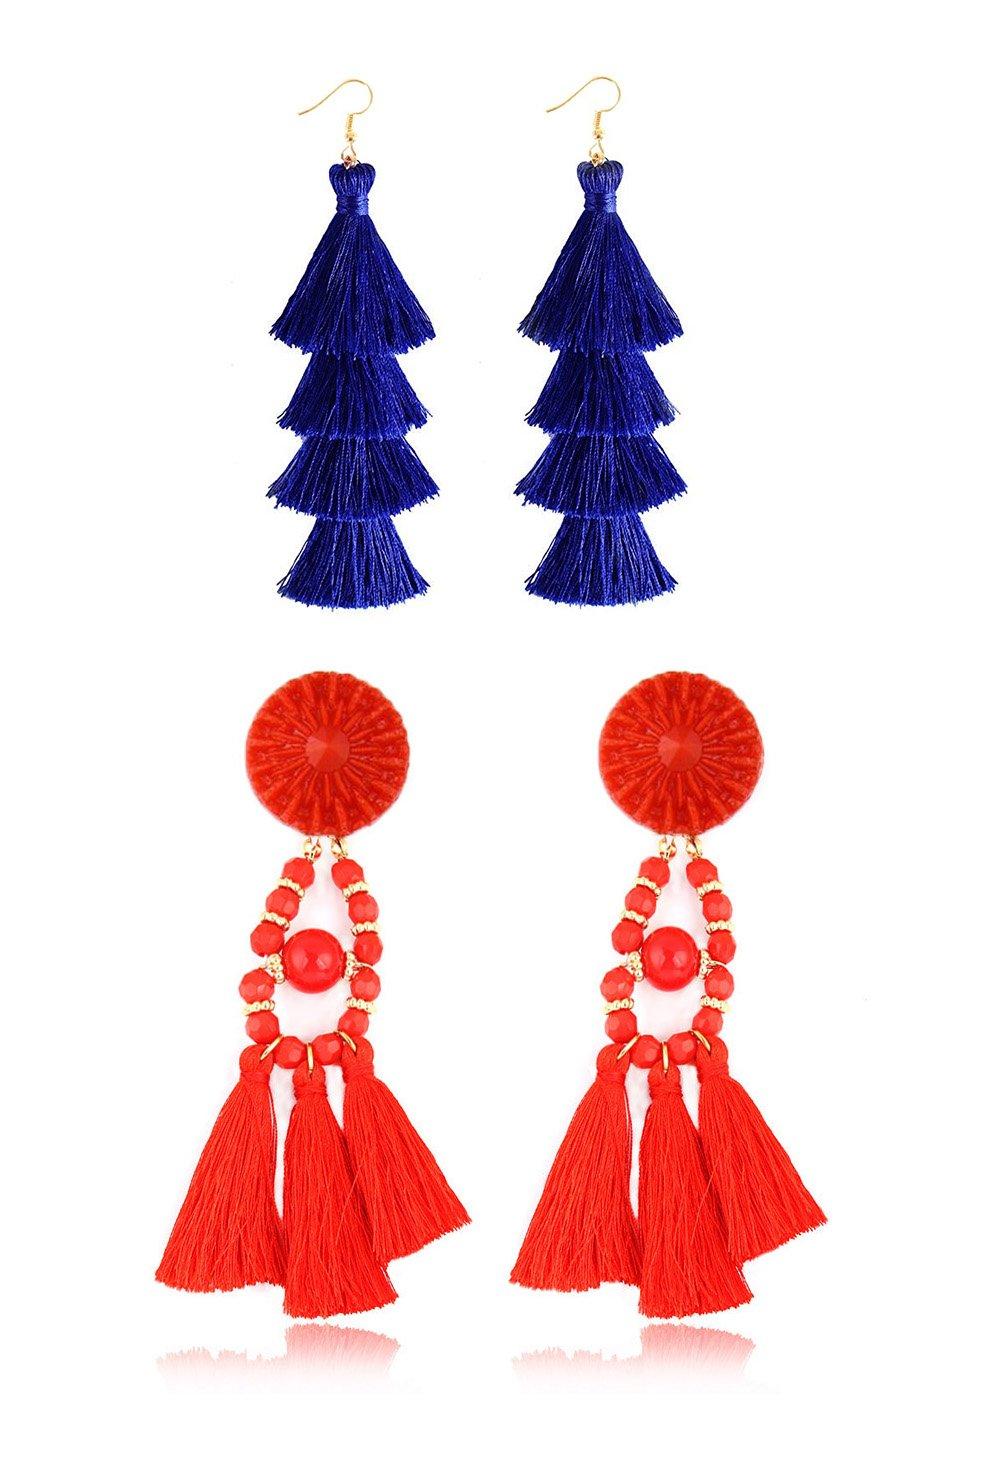 Fashion Tassel Earrings Handmade Bohemian Statement Chandelier Red Tassel Earrings Stud with Roud bead and Tiered Thread Royal Blue Tassel Drop Dangle Earring 2 Pairs